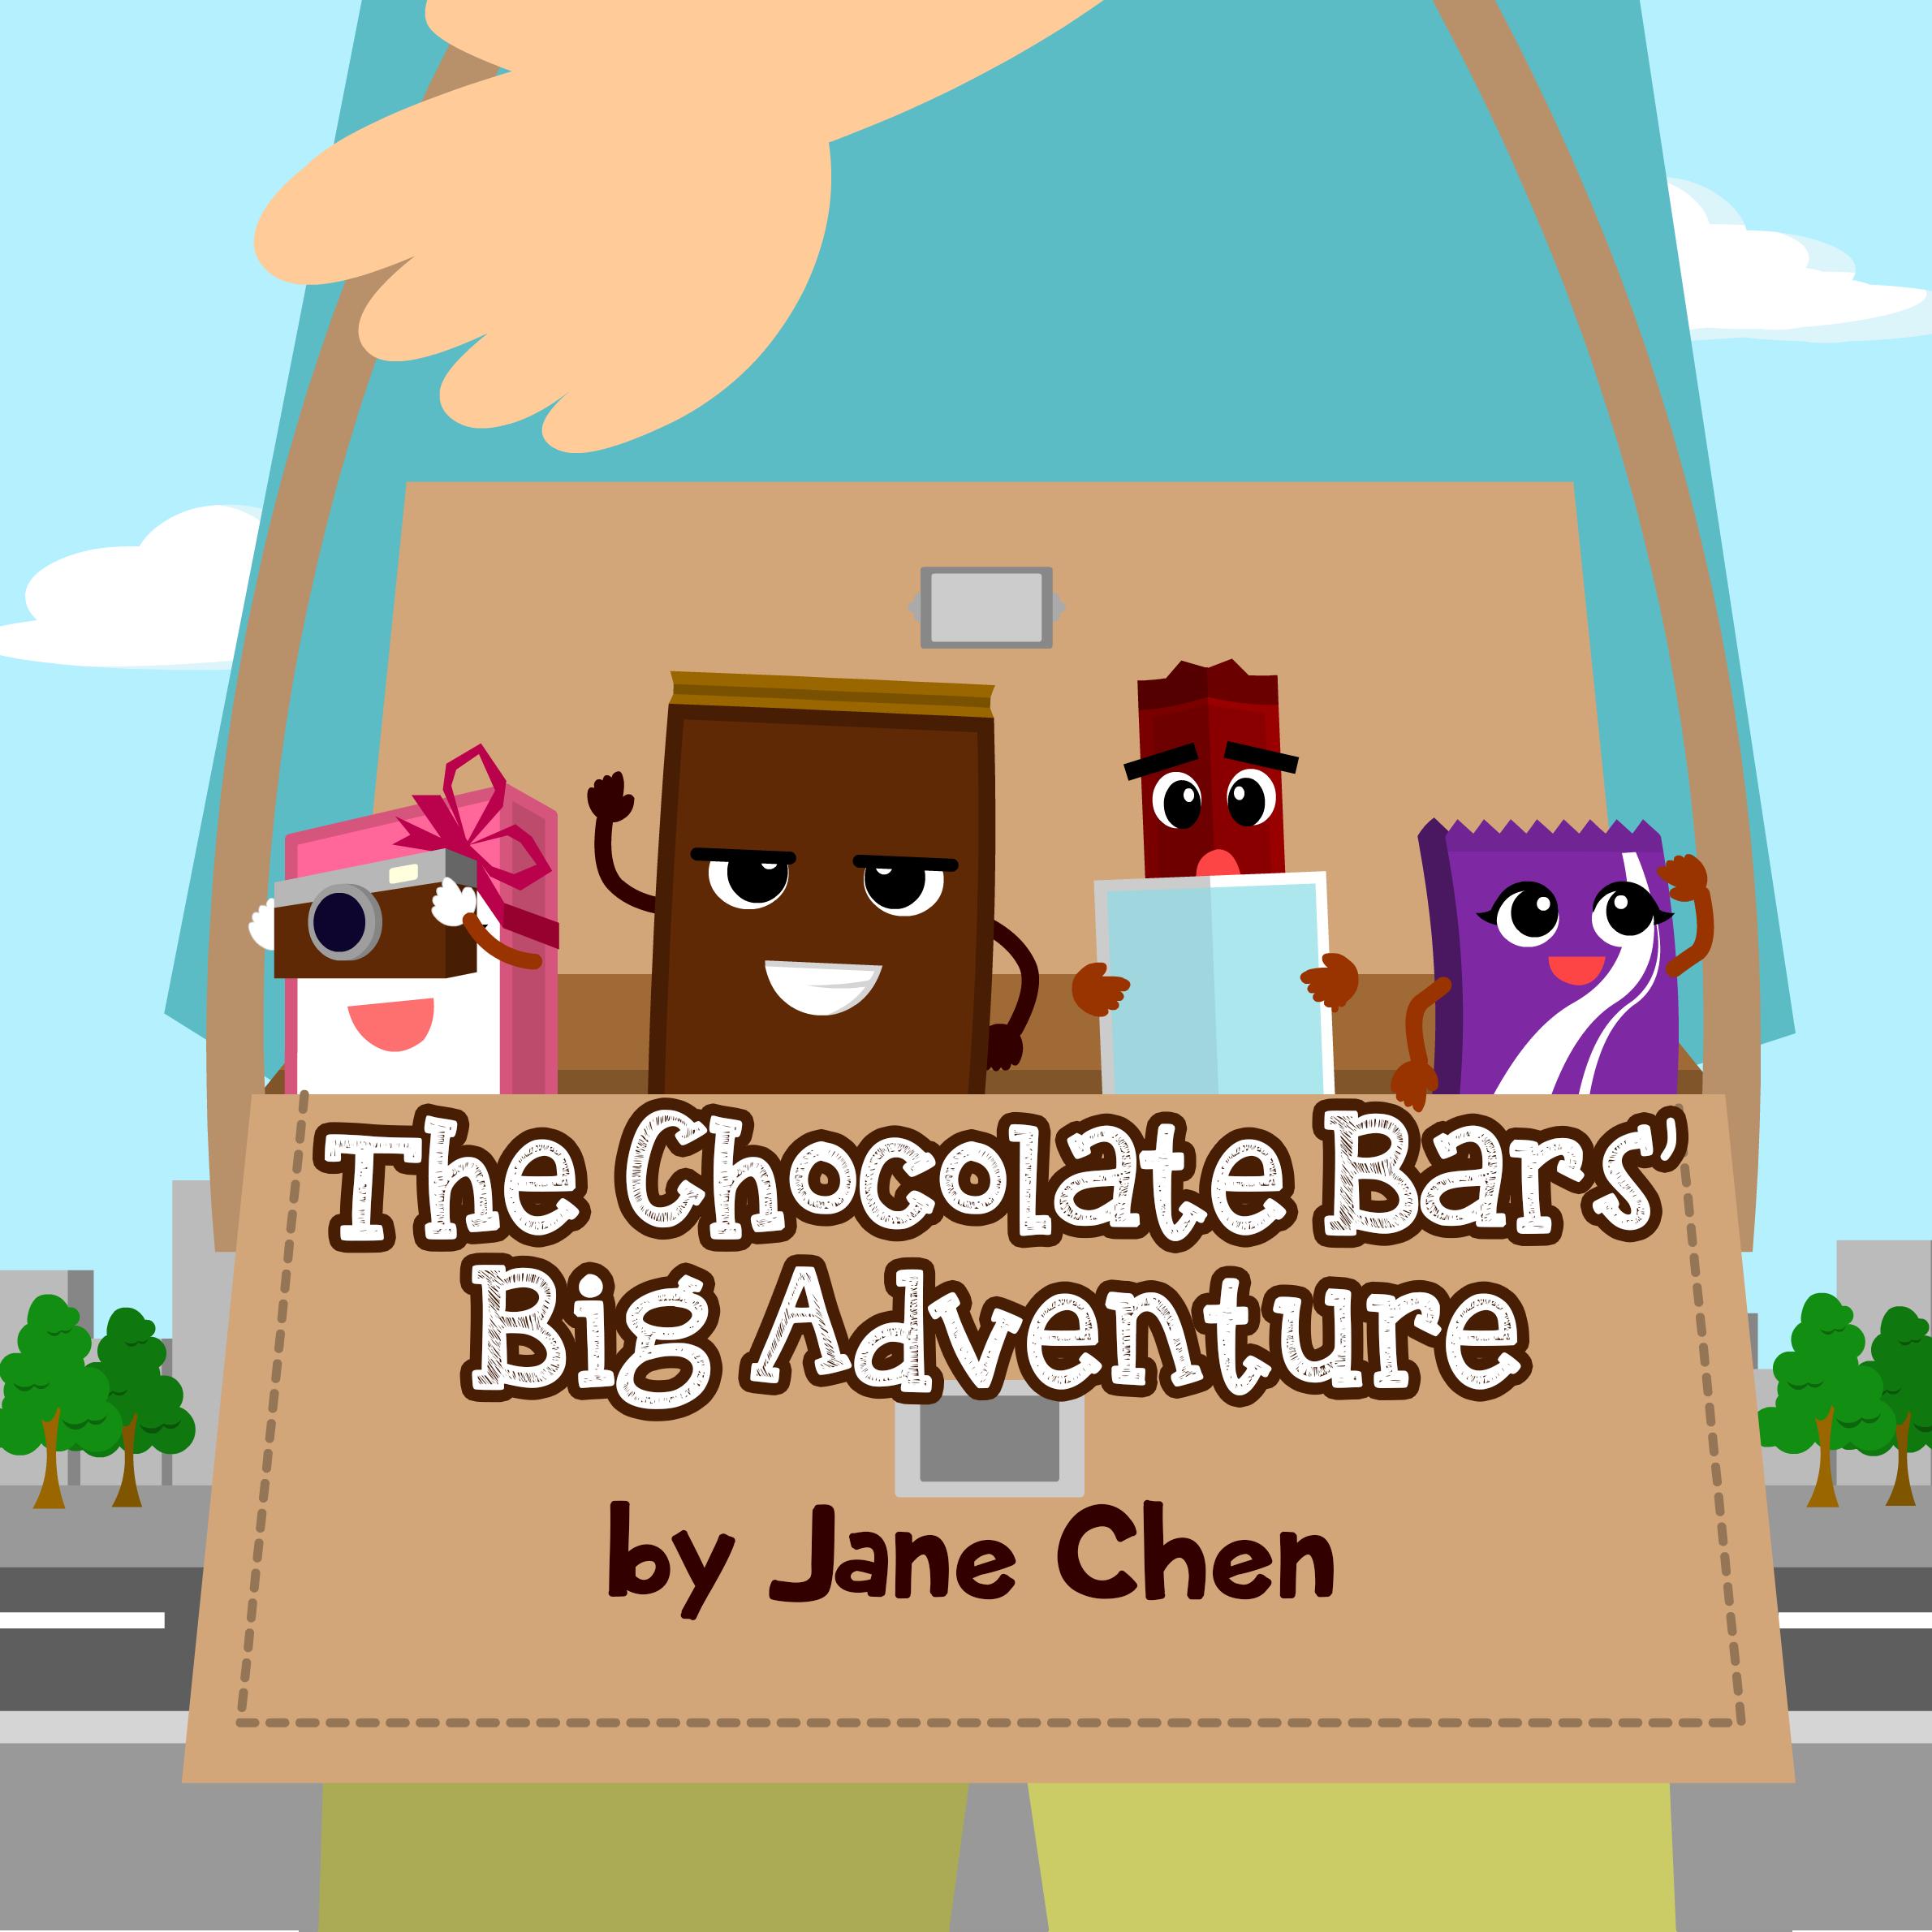 The Chocolate Bars' Big Adventure